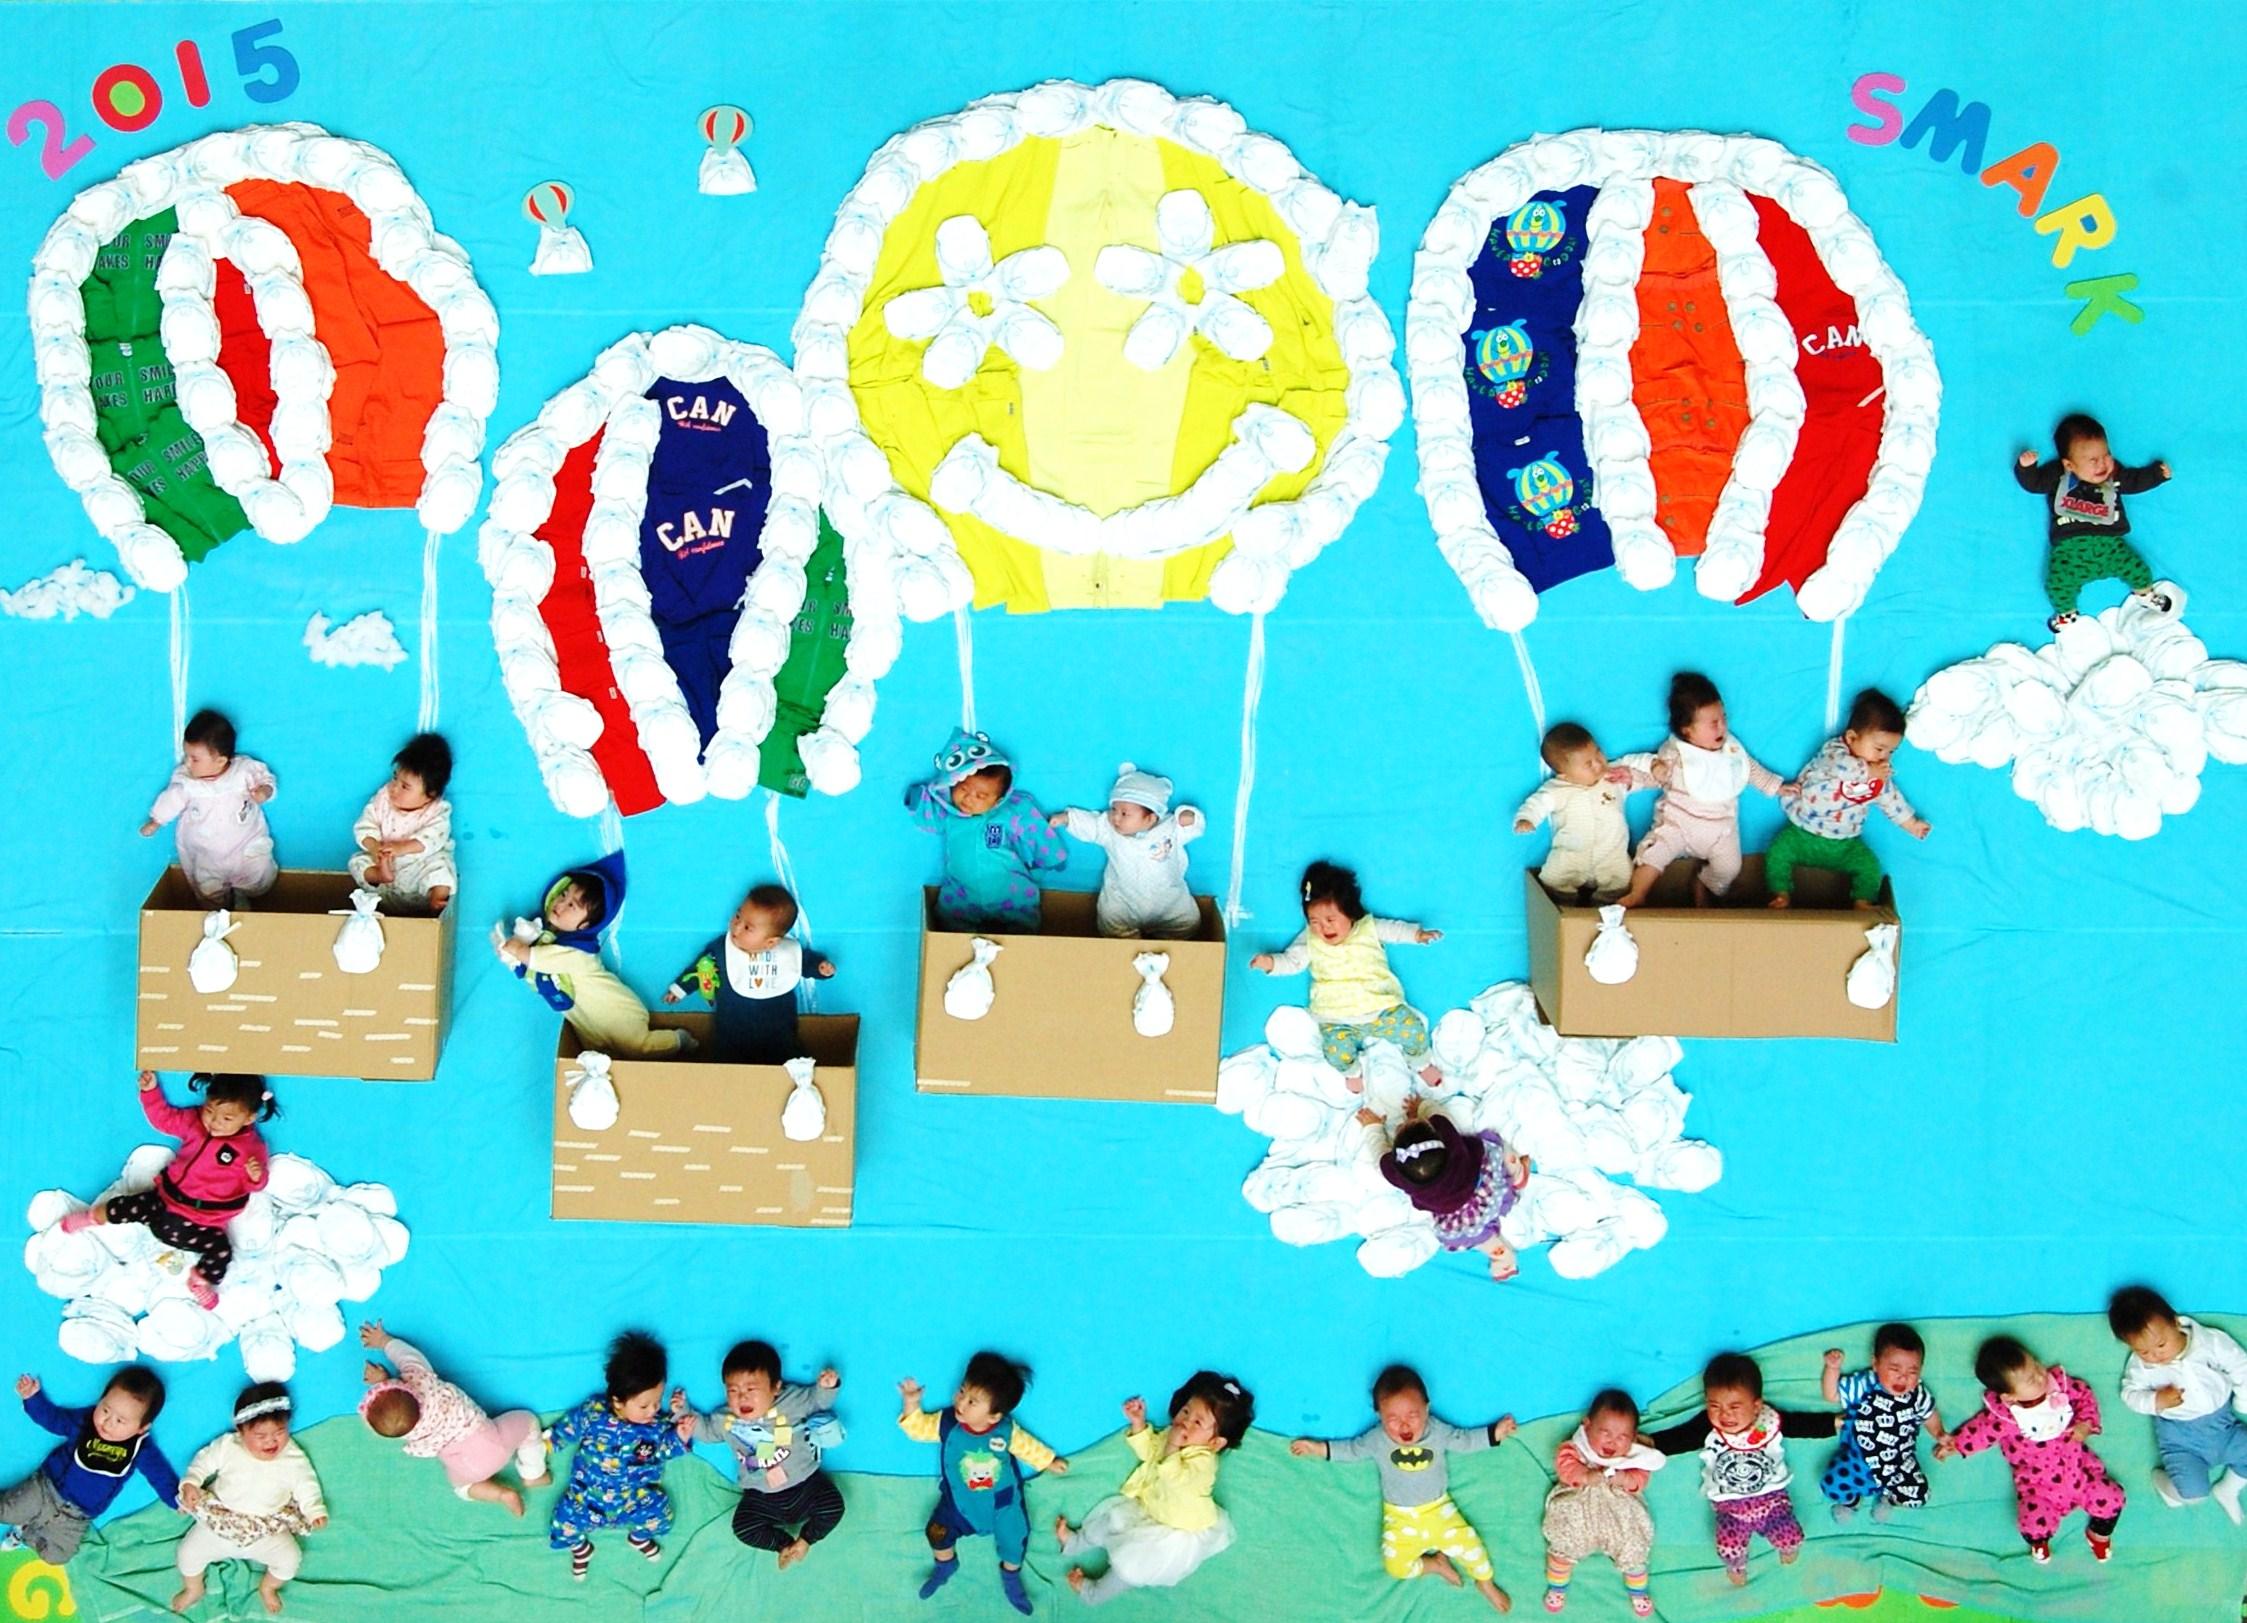 2015.4.4SMARK巨大寝相アート気球1